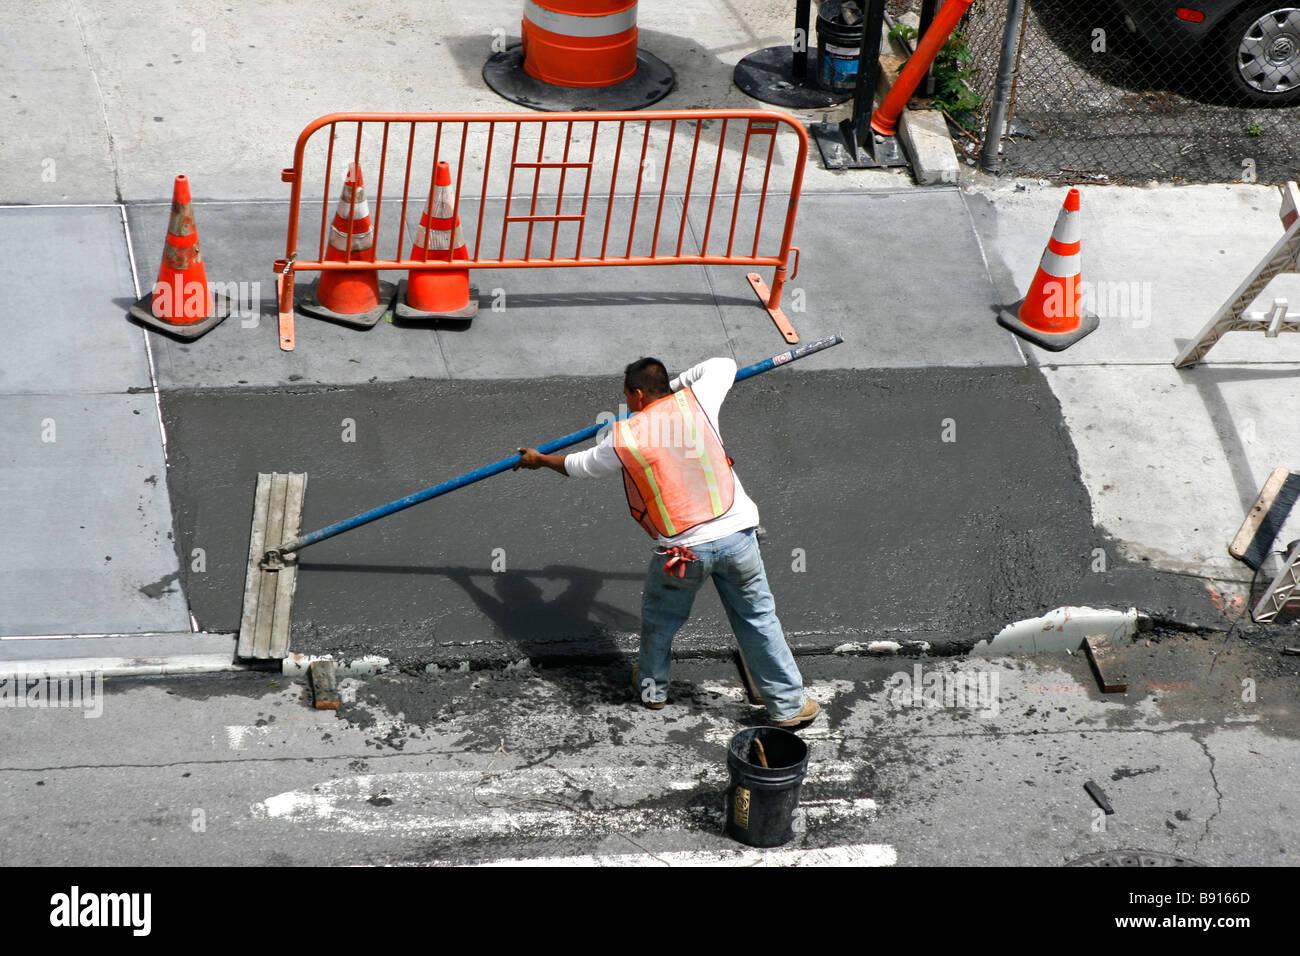 Man smoothing a freshly poured wet concrete sidewalk. Stock Photo